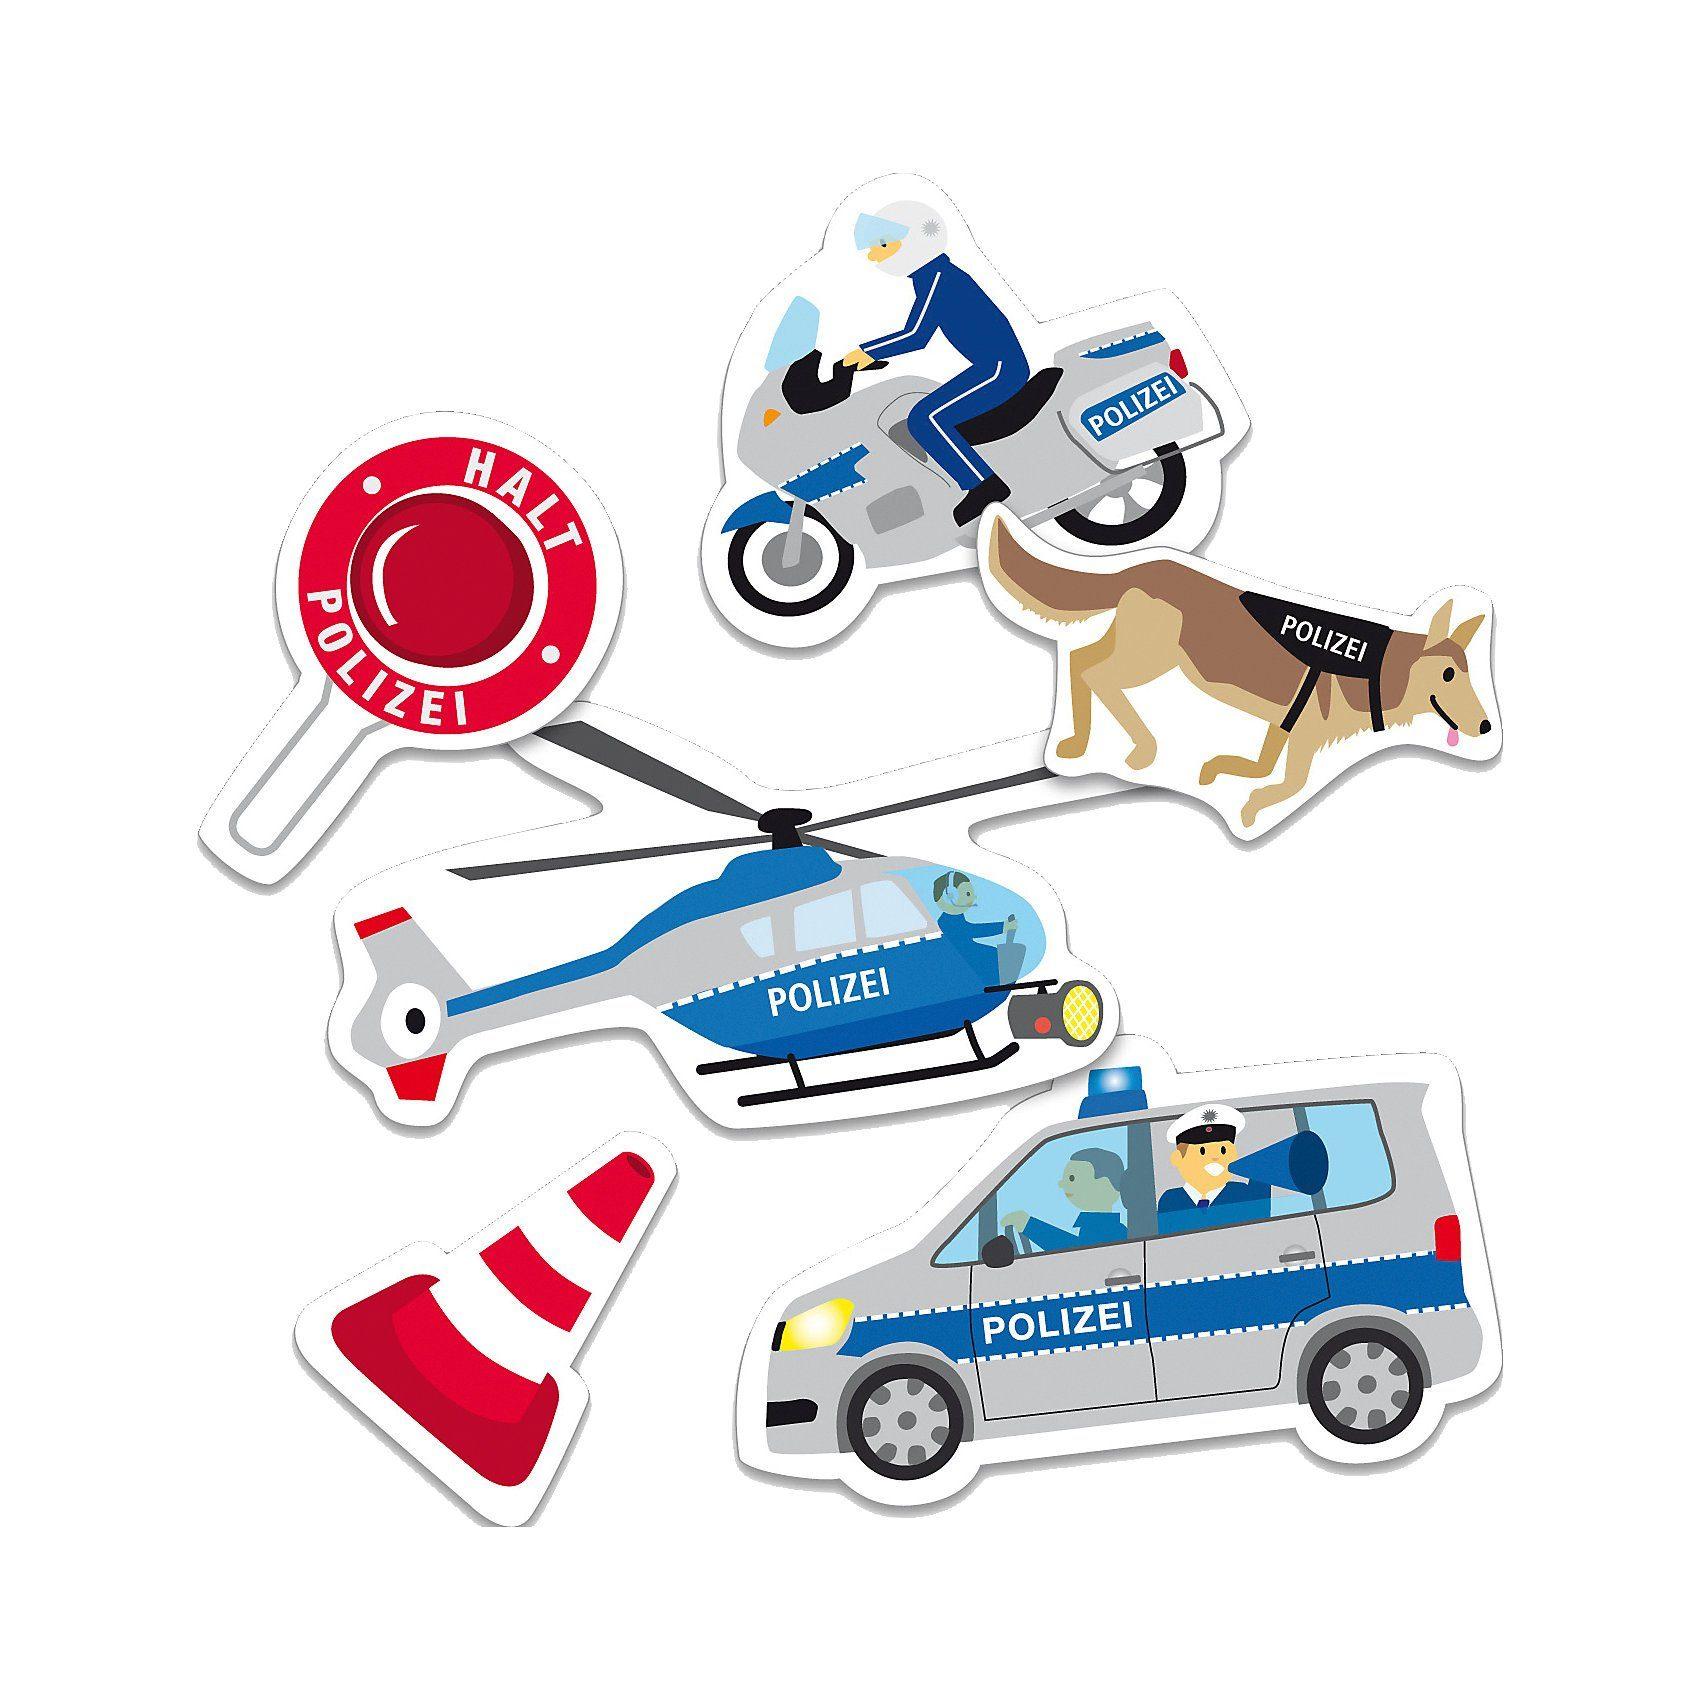 dh konzept XXL-Konfetti Polizei, 24-tlg.